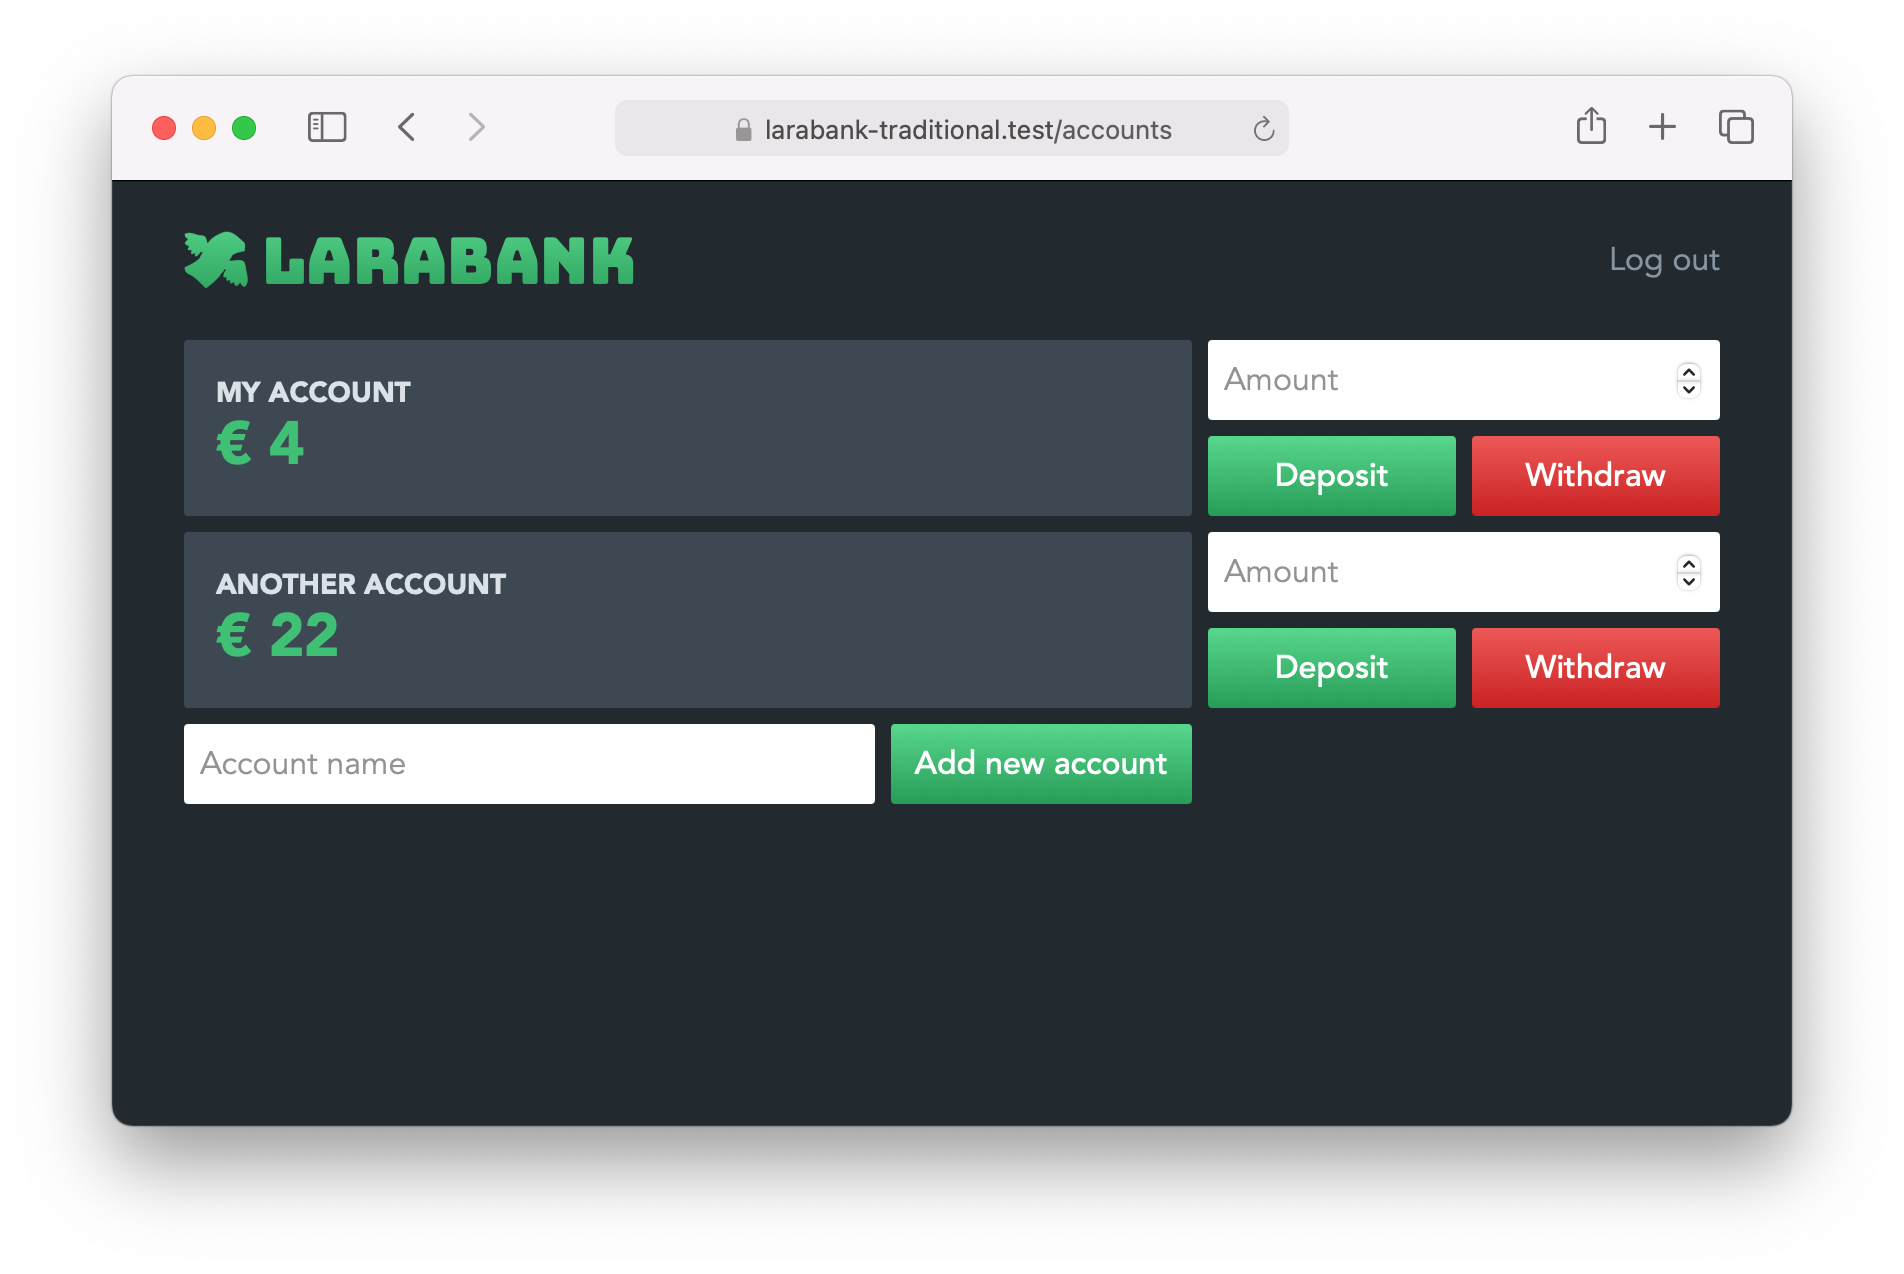 Larabank accounts page